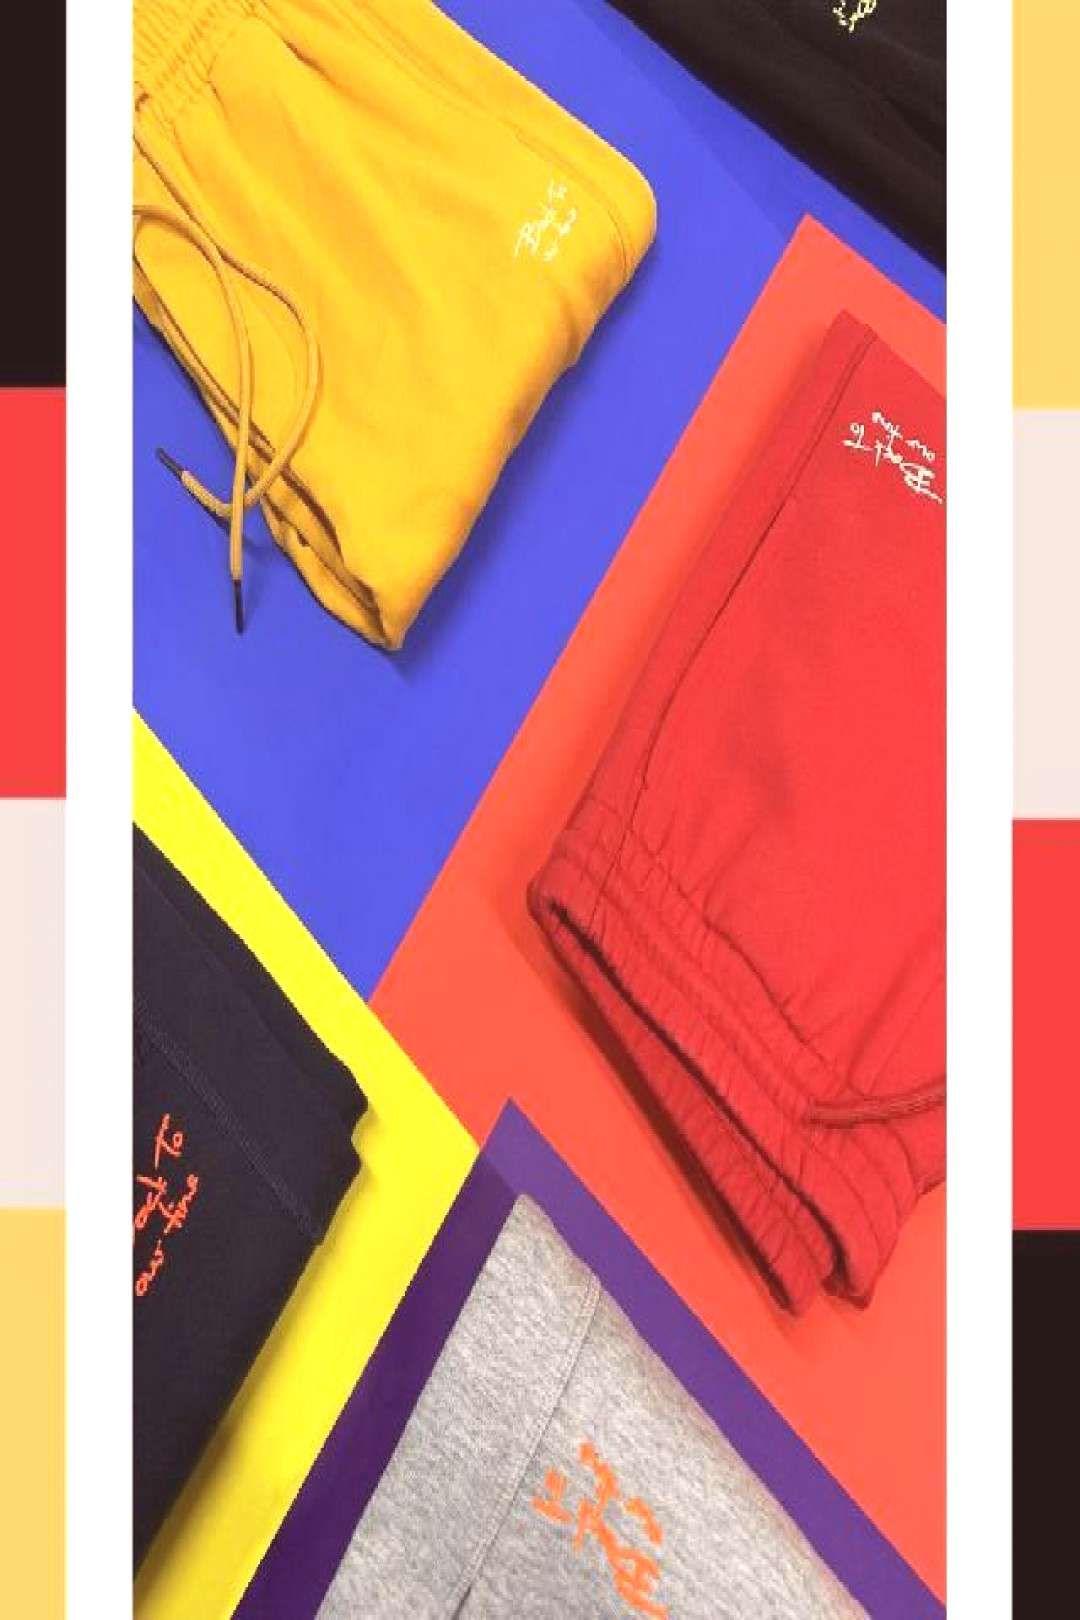 #anklelength #sweatpants #drawstring #fernando #february #cotton #jogger #casual #edmund #232020 #photo #men #100 #by #on Men 100% Cotton Jogger Sweatpants Drawstring Ankle-Length Casual You c...